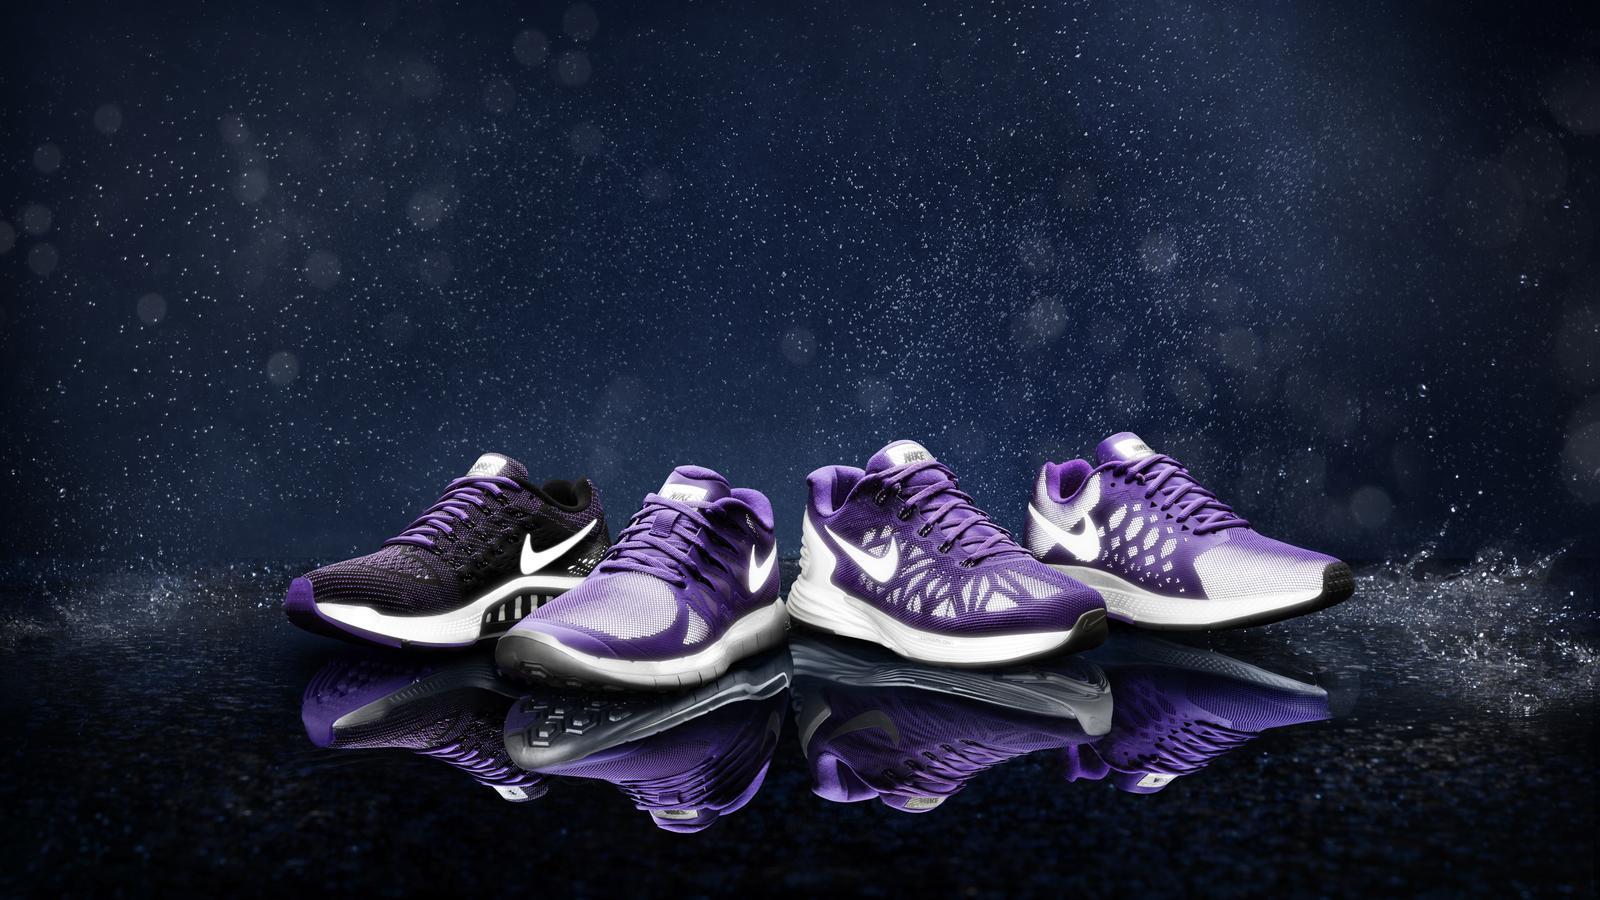 Nike Footwear Womens Shoes Run Training Wallpaper 2018 In Running